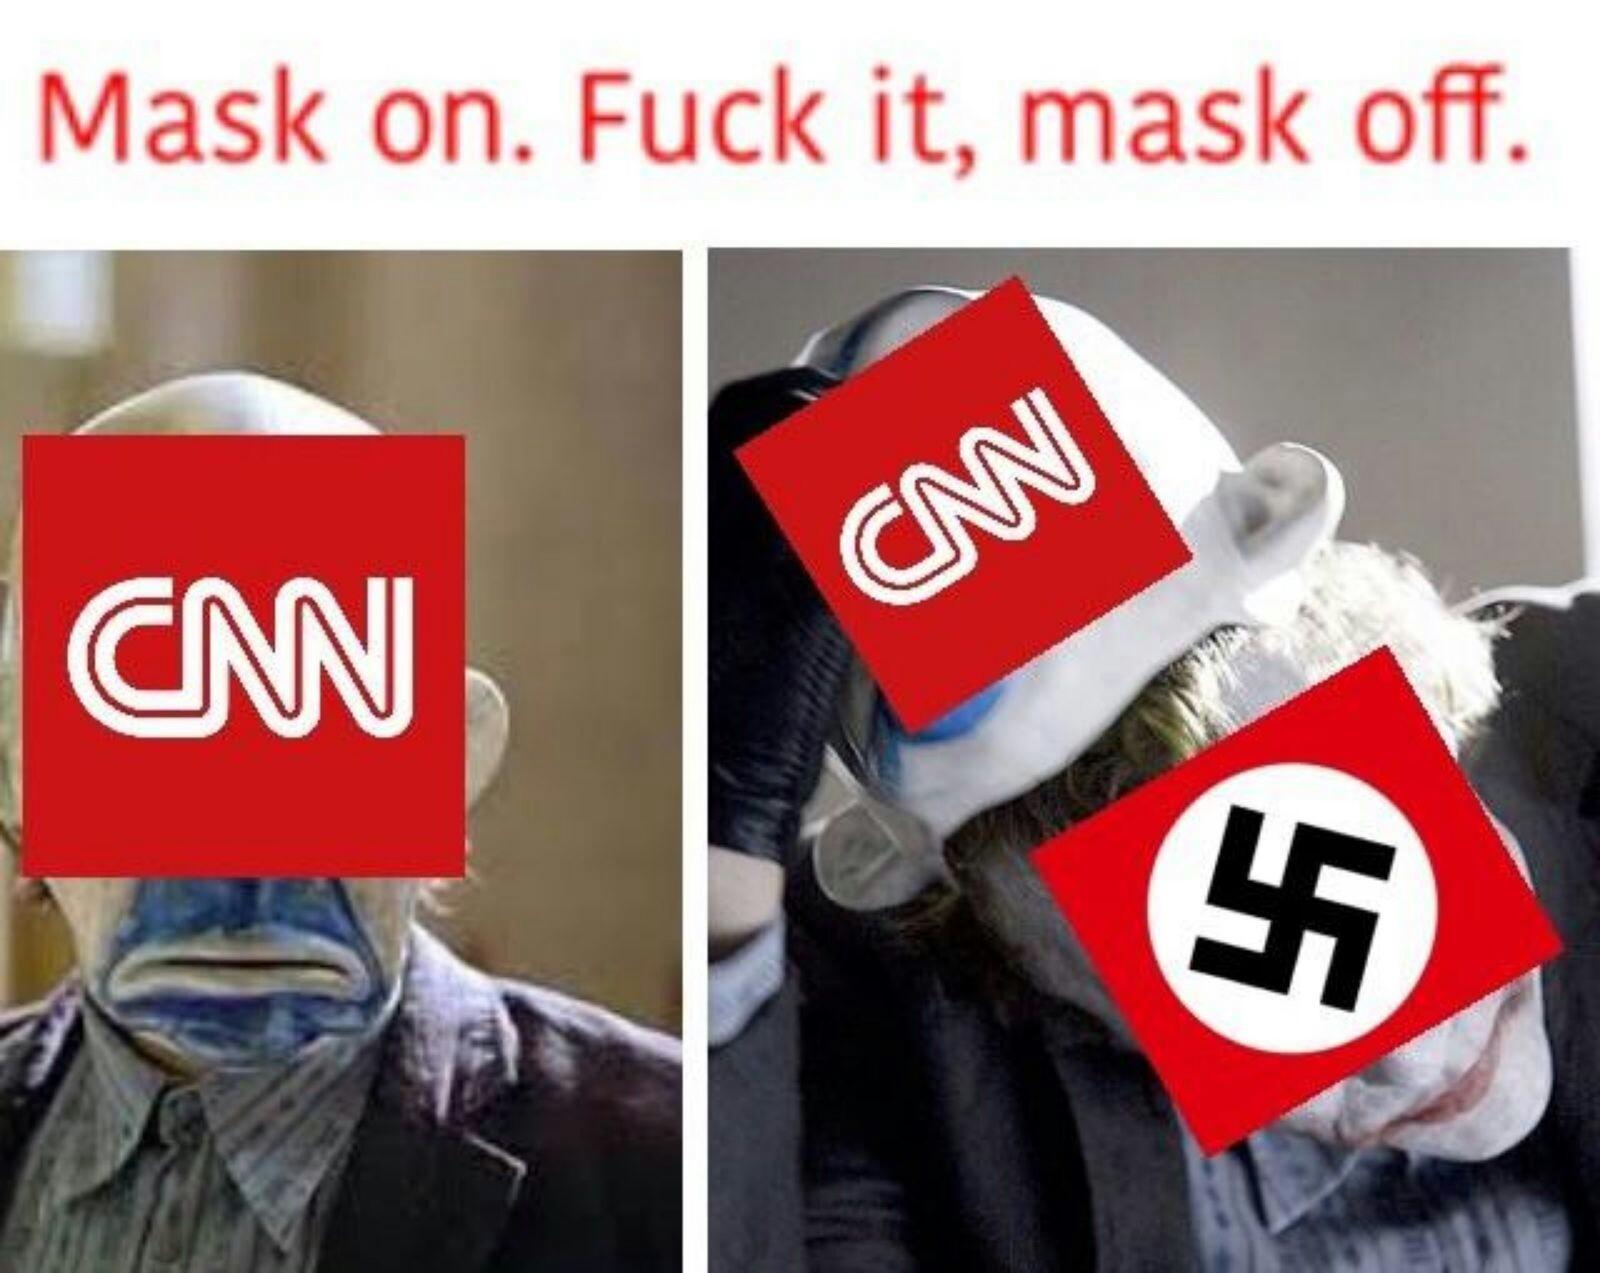 Fuck it mask off - meme